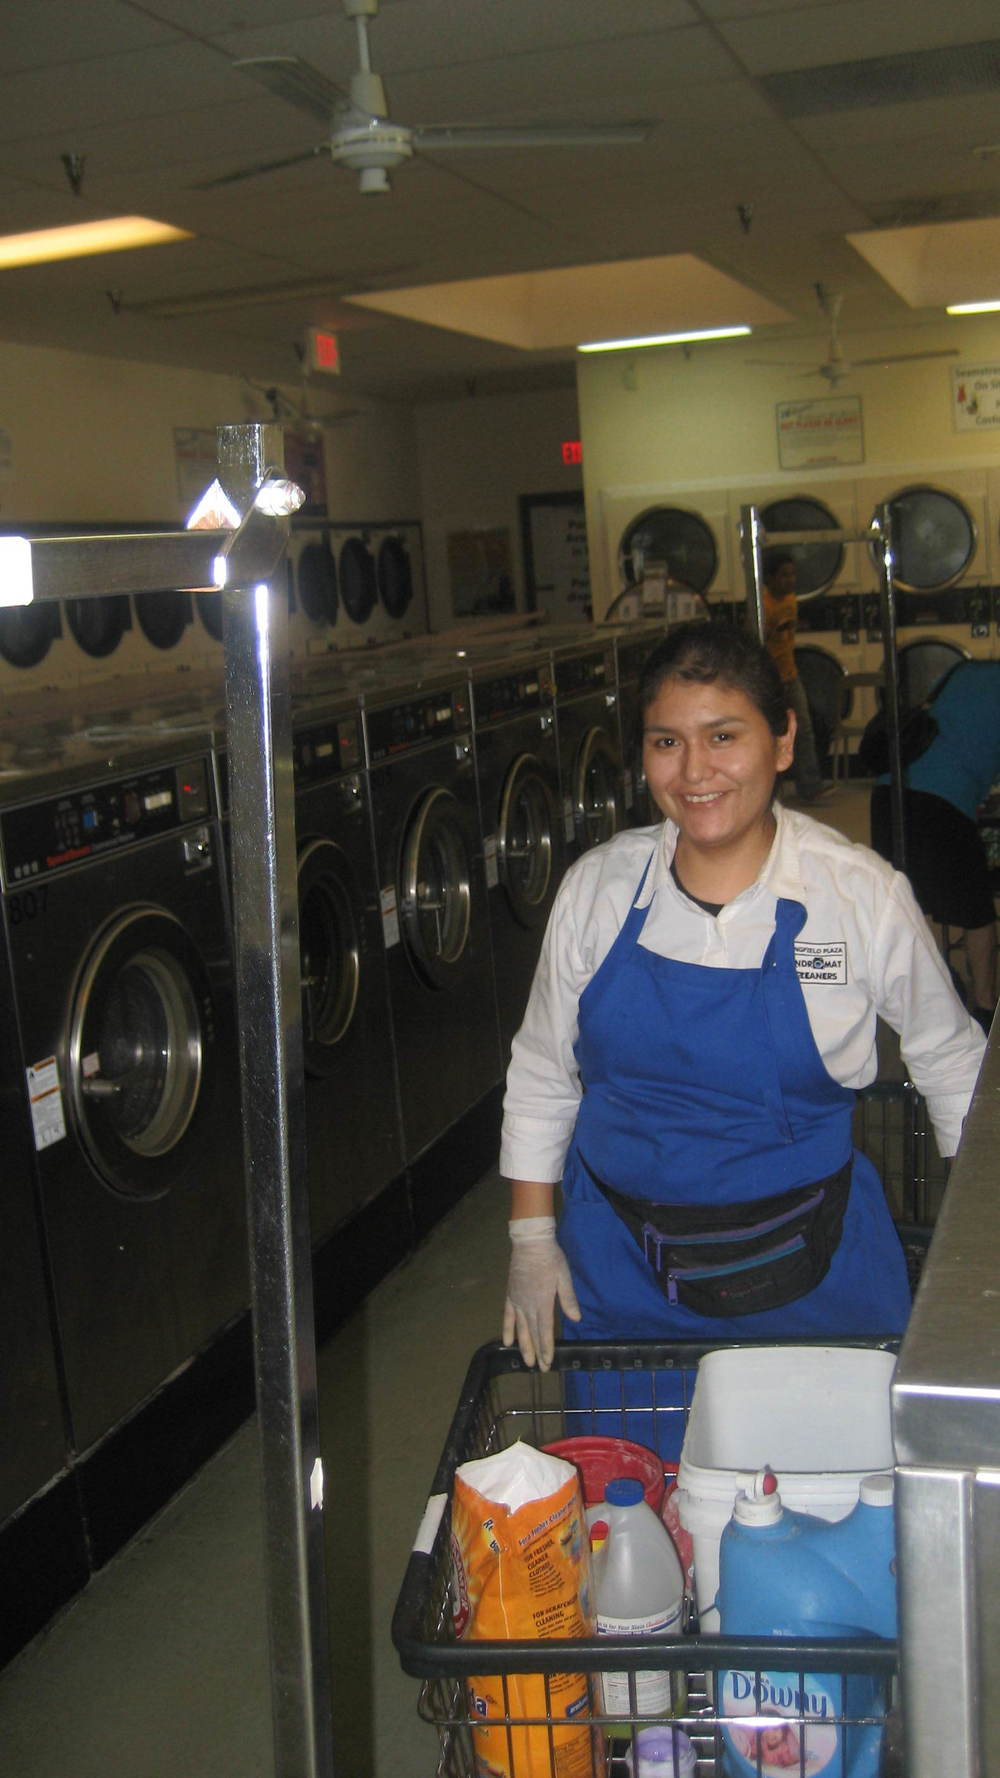 Laundromat 001.jpg